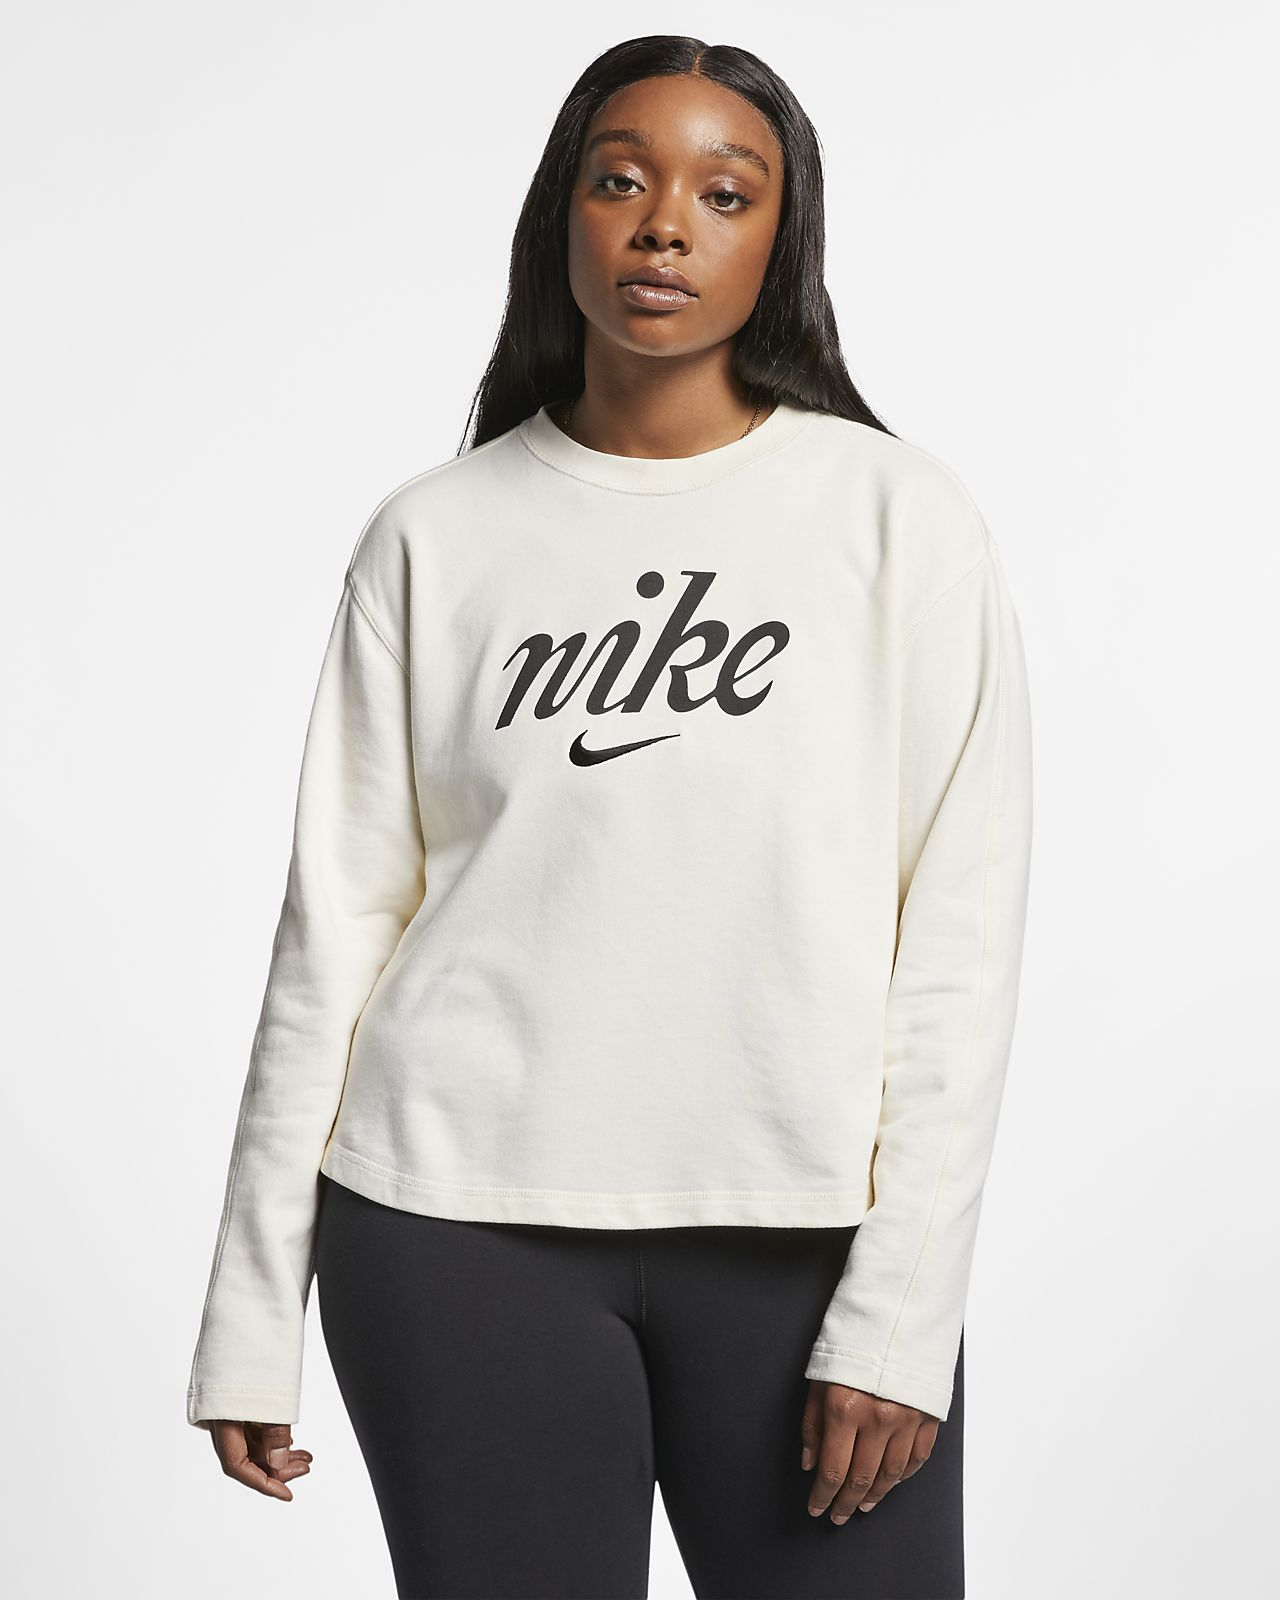 cde8e16ad Nike Sportswear Women s Cropped Crew (Plus Size). Nike.com